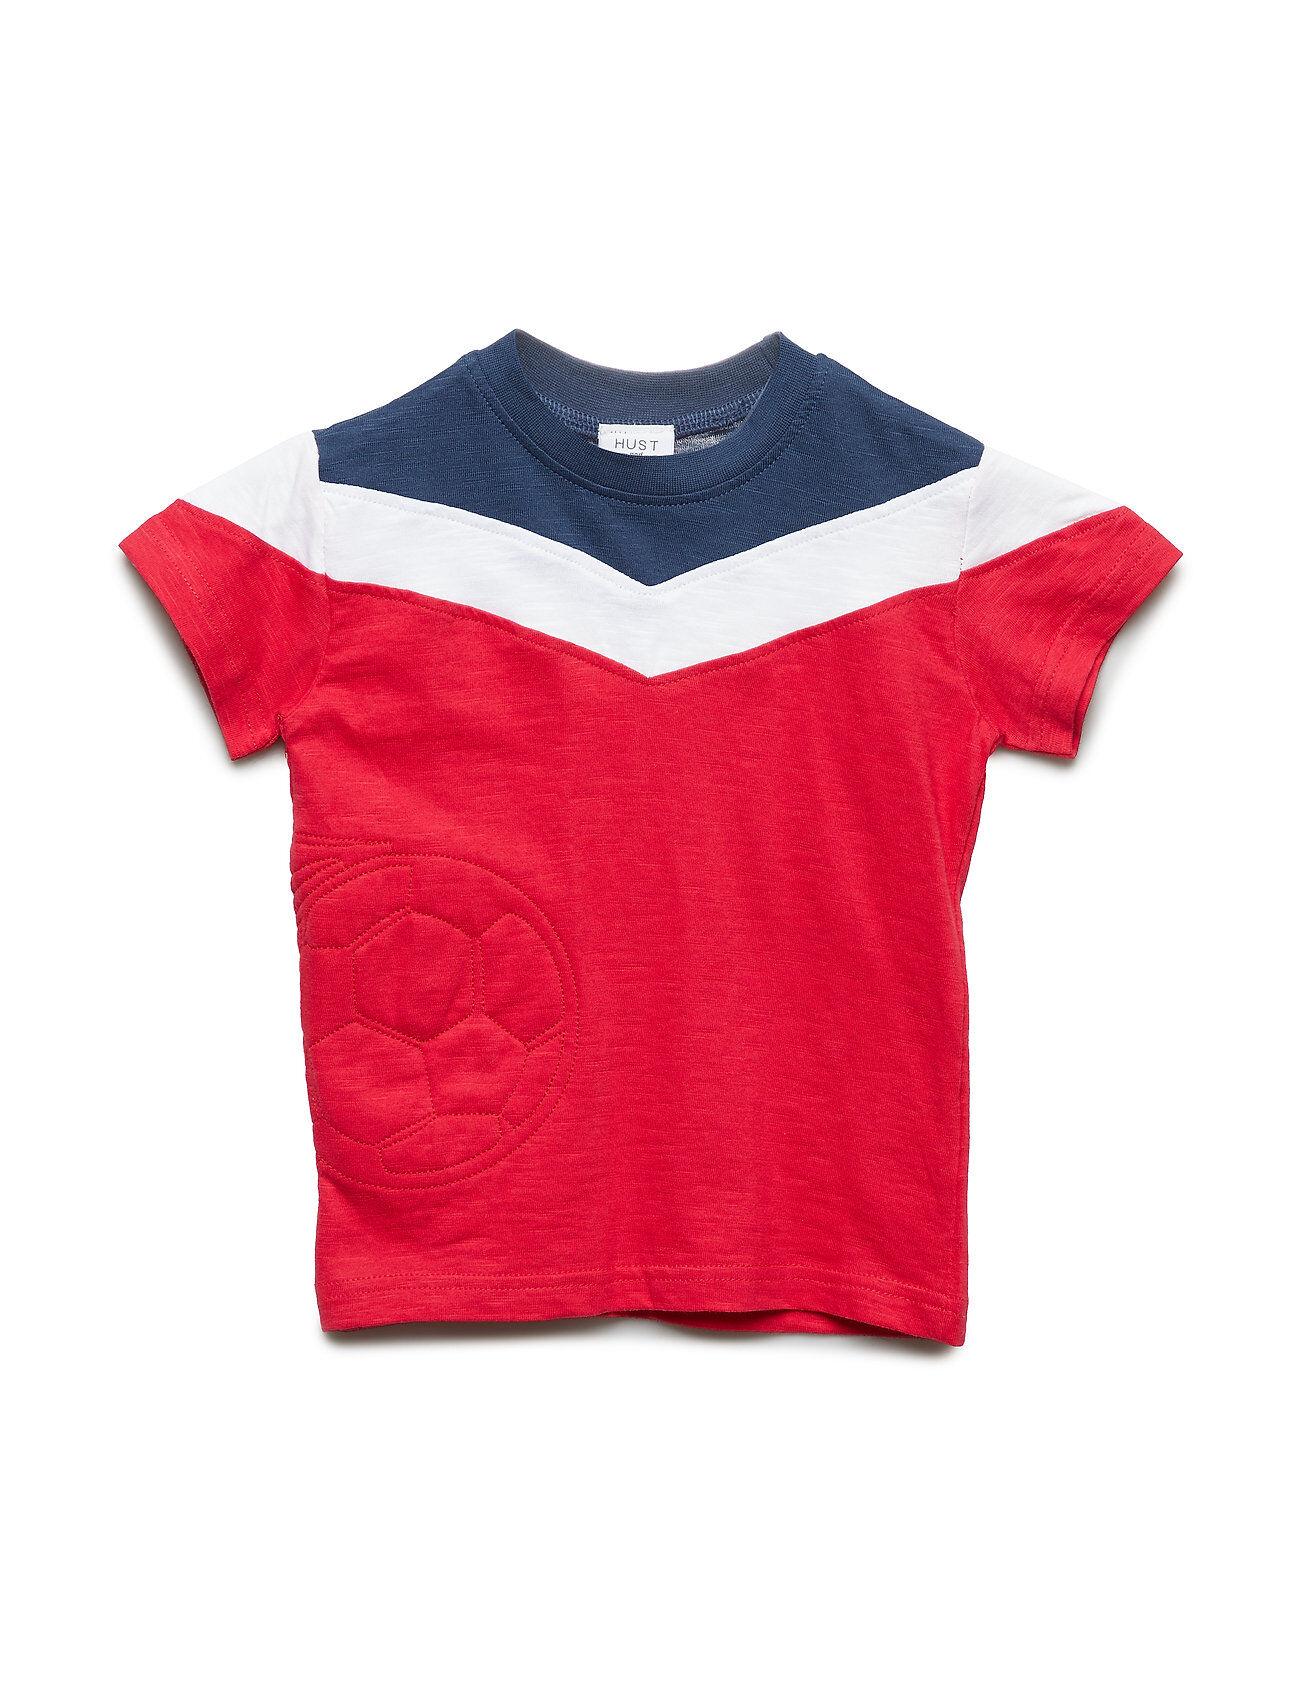 Hust & Claire Arthur - T-Shirt S/S T-shirts Short-sleeved Punainen Hust & Claire